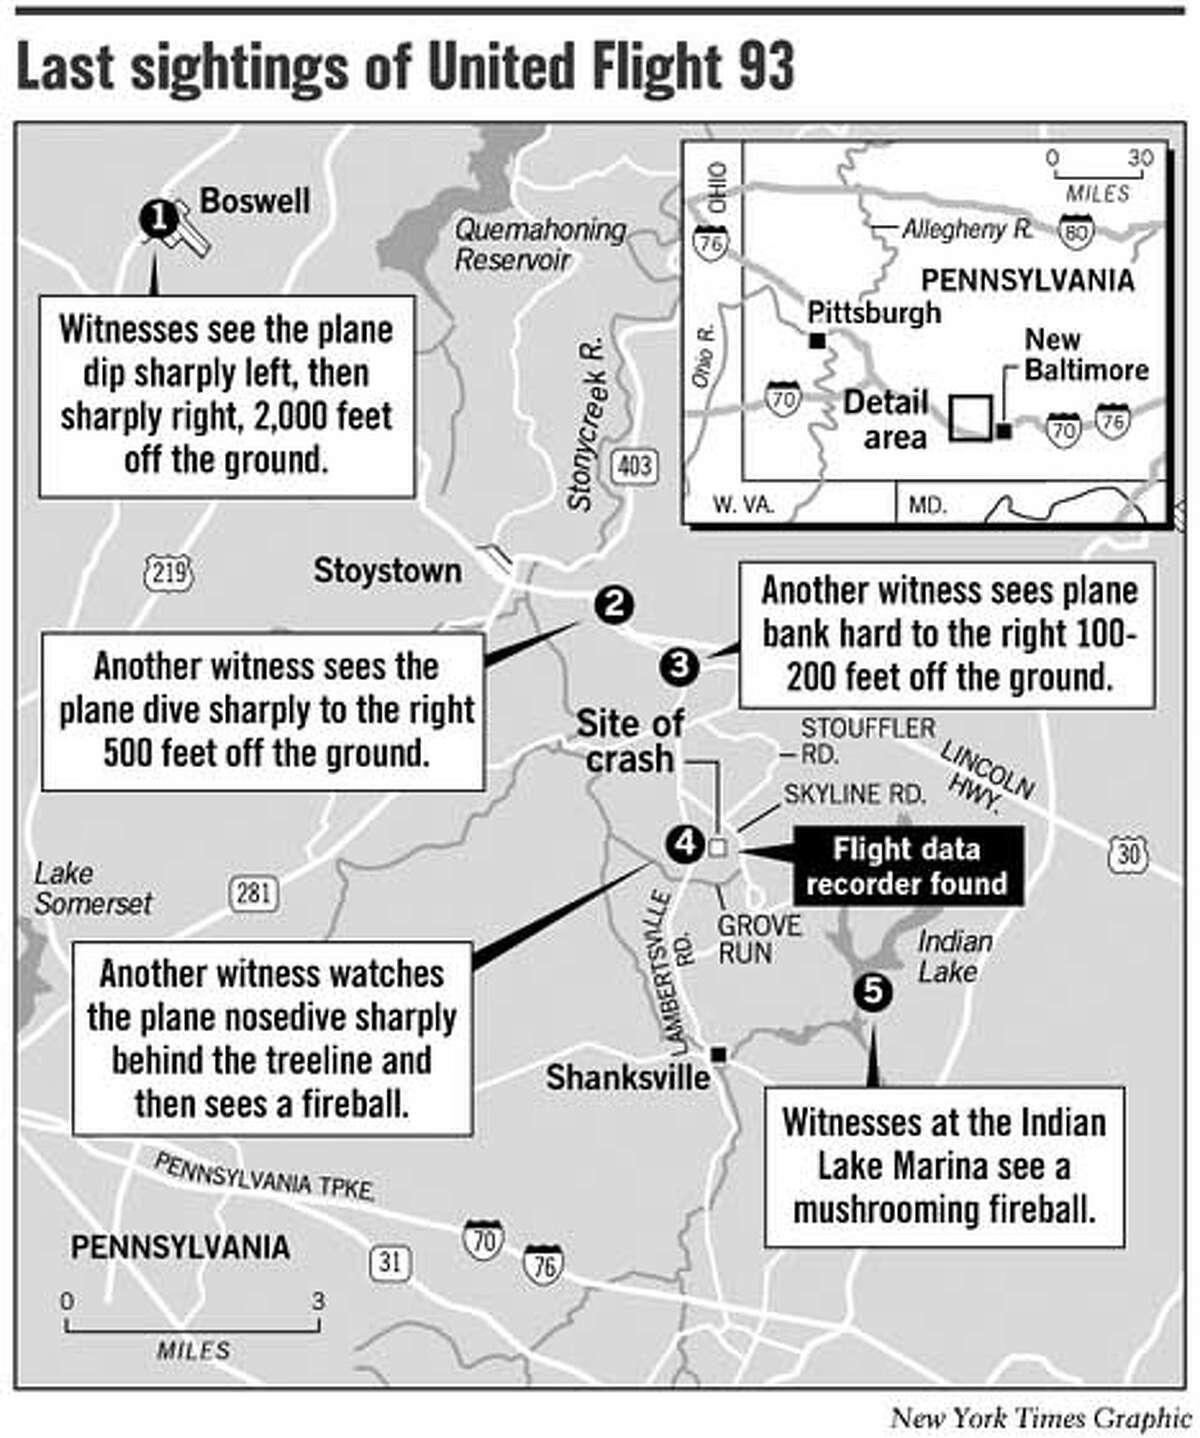 Last Sightings of United Flight 93. New York Times Graphic